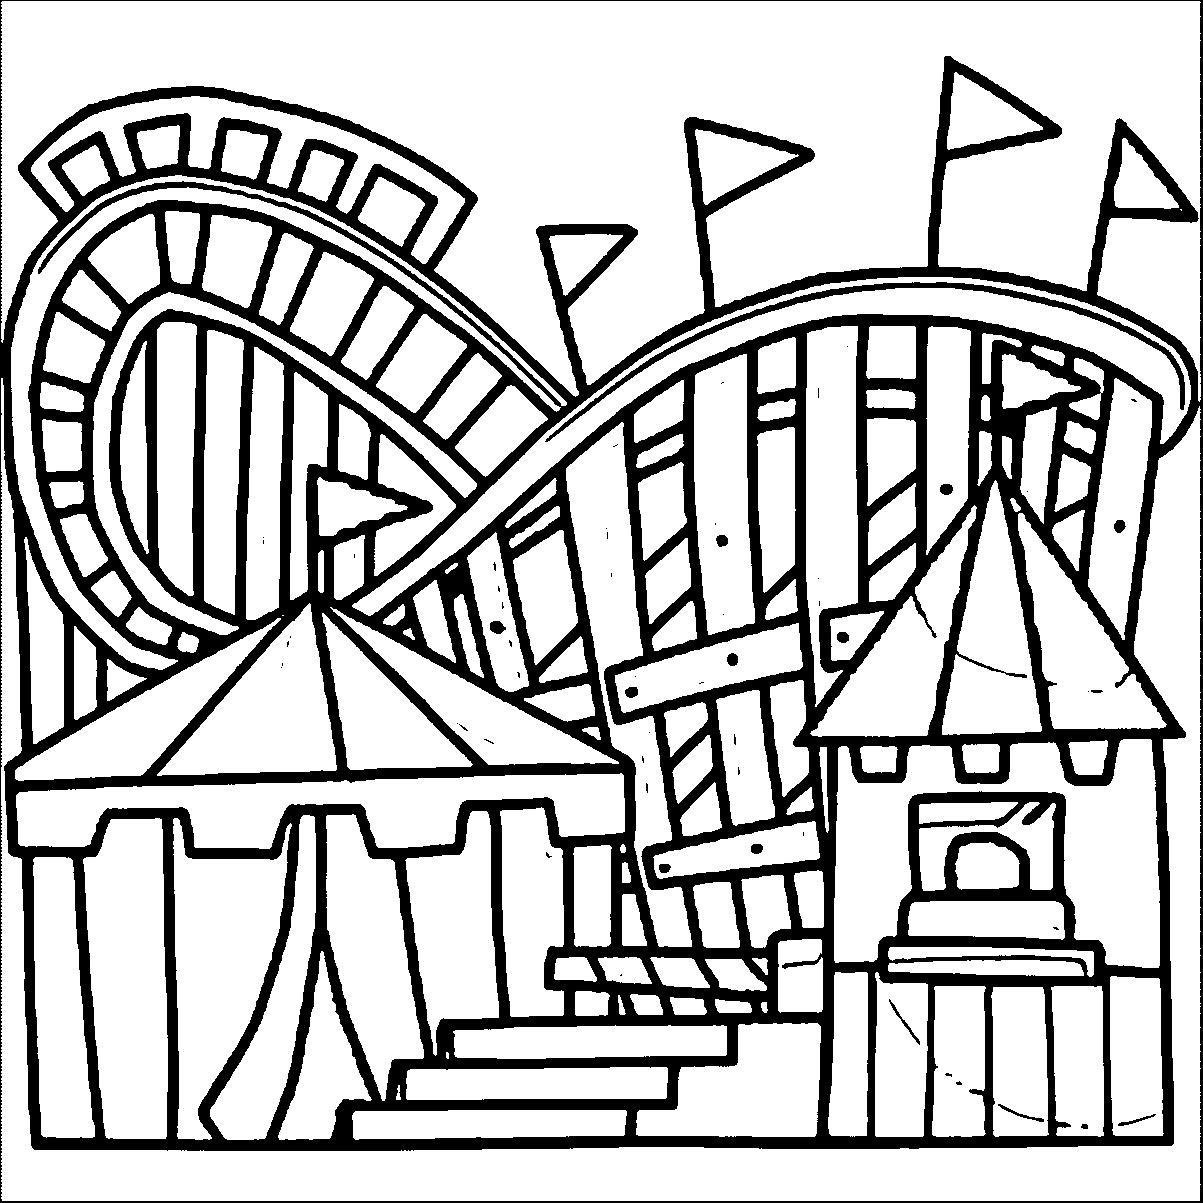 1203x1203 Amusement Park Coloring Pages To Print Coloring Pages